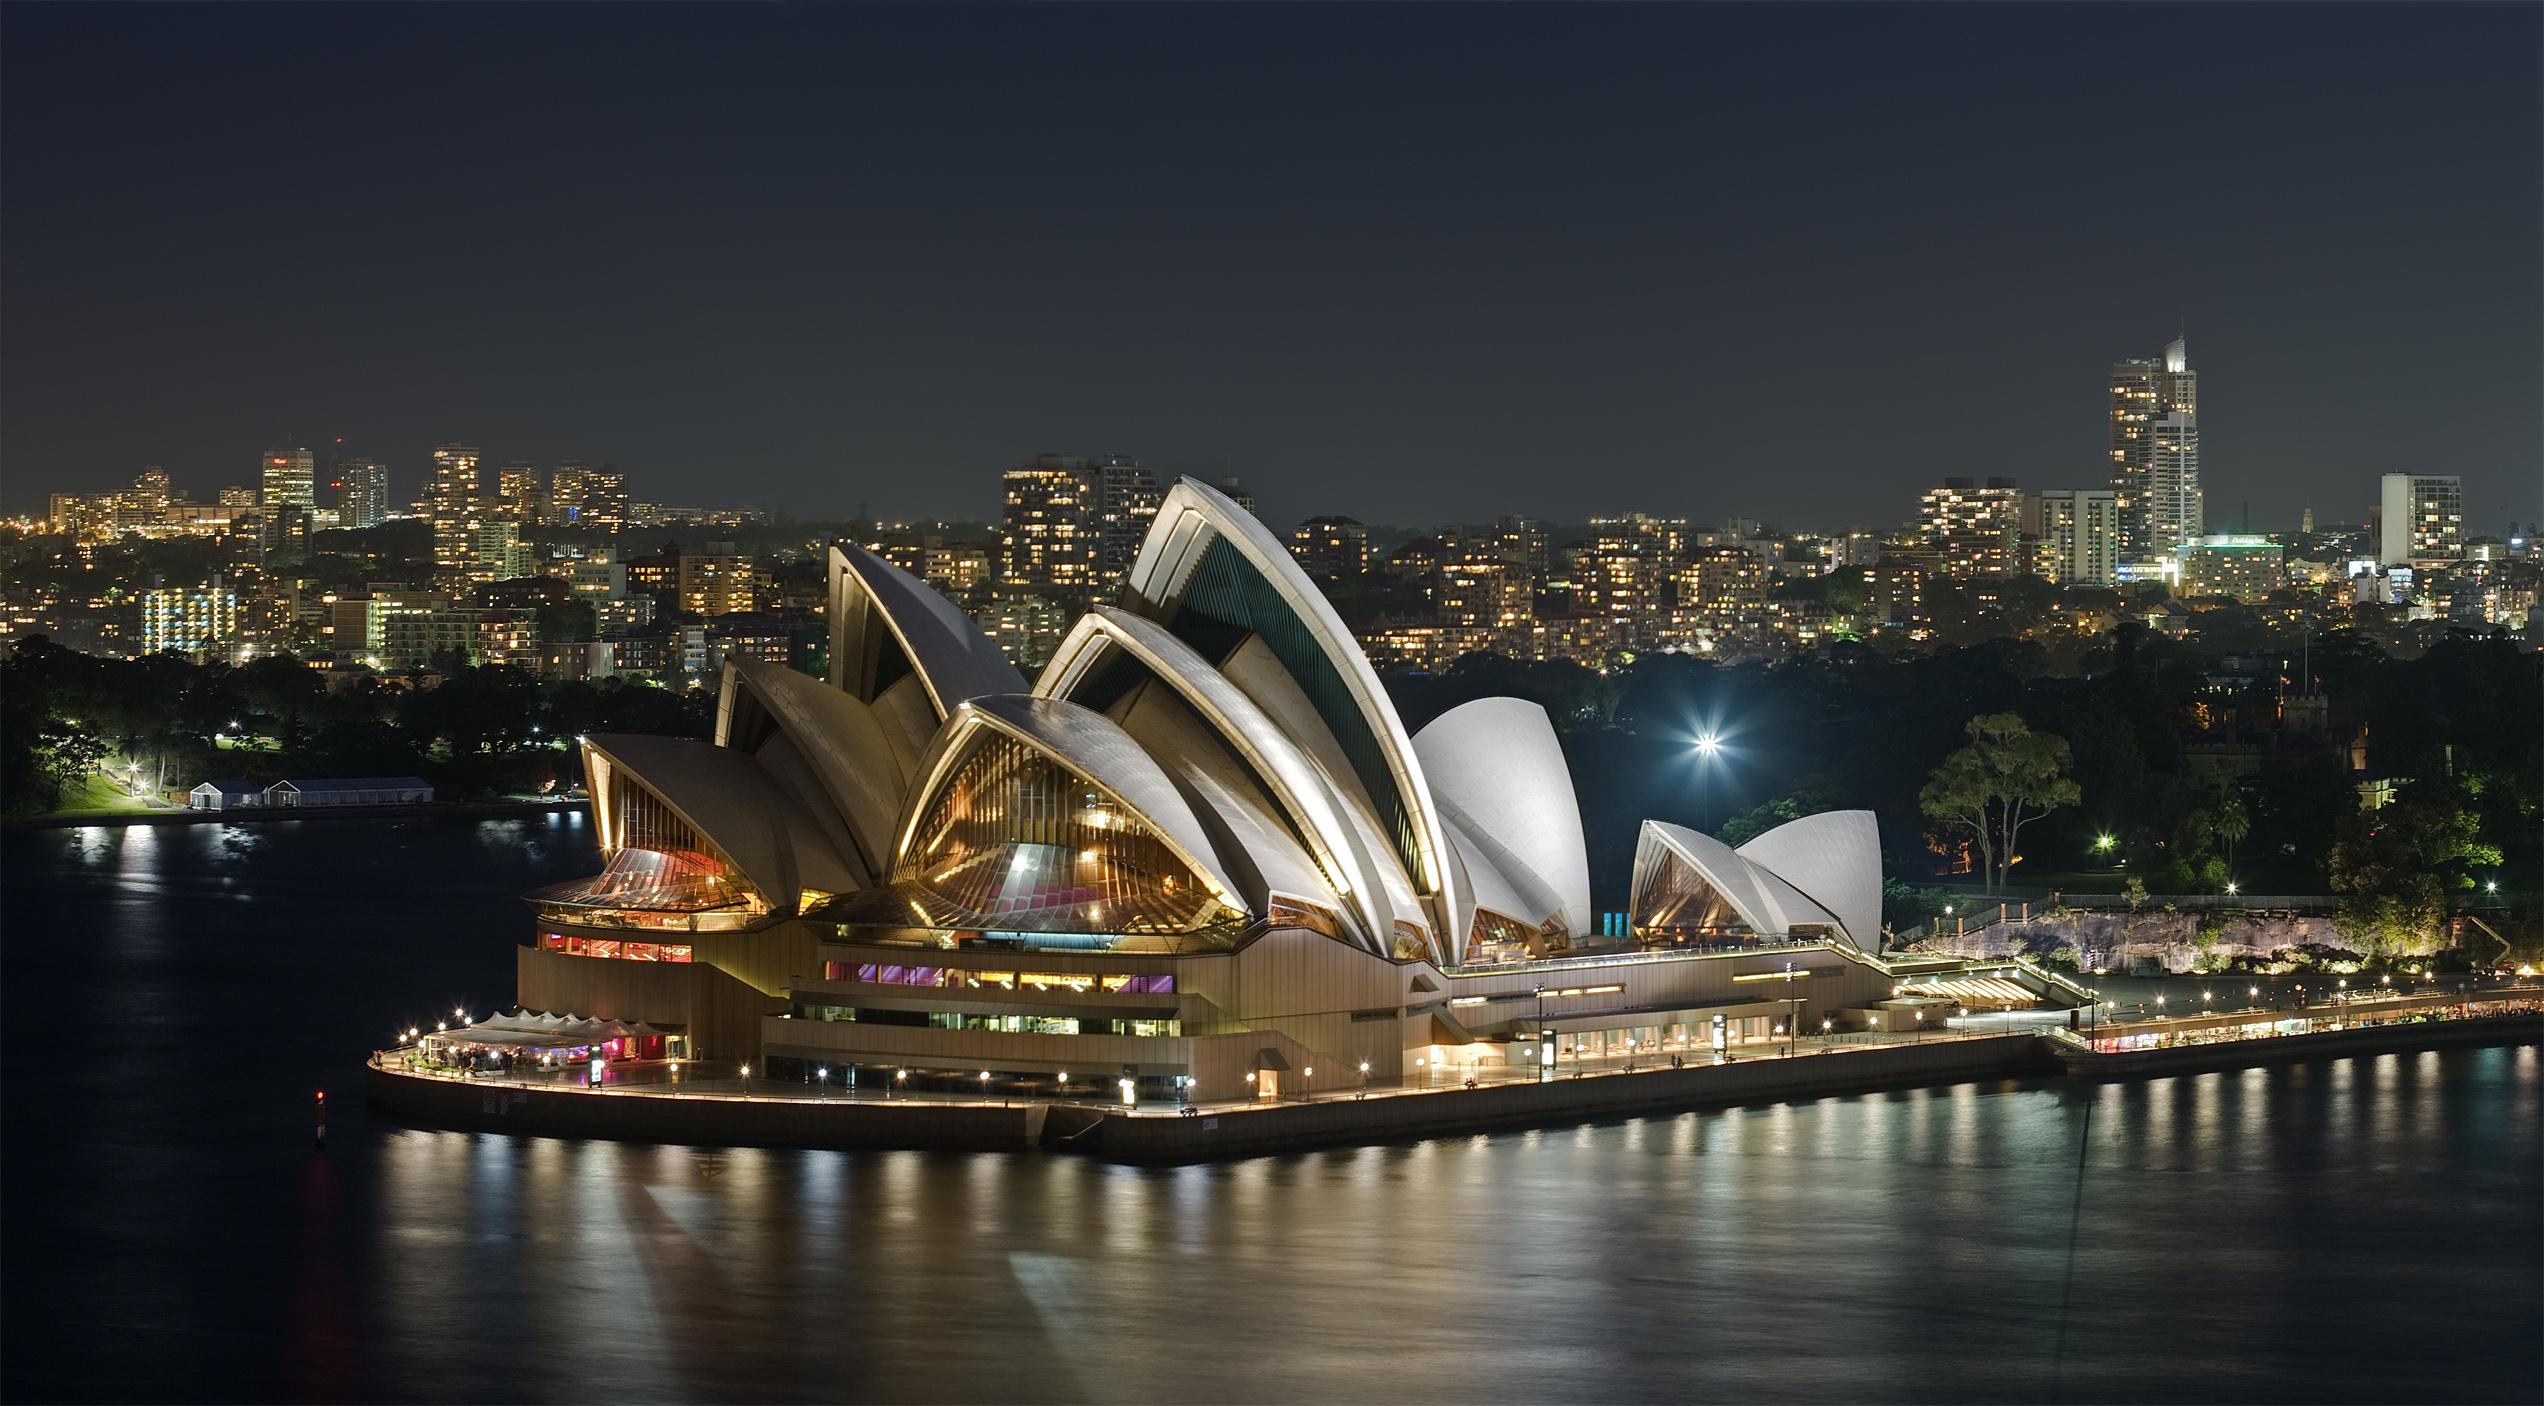 https://i2.wp.com/upload.wikimedia.org/wikipedia/commons/7/7c/Sydney_Opera_House_-_Dec_2008.jpg